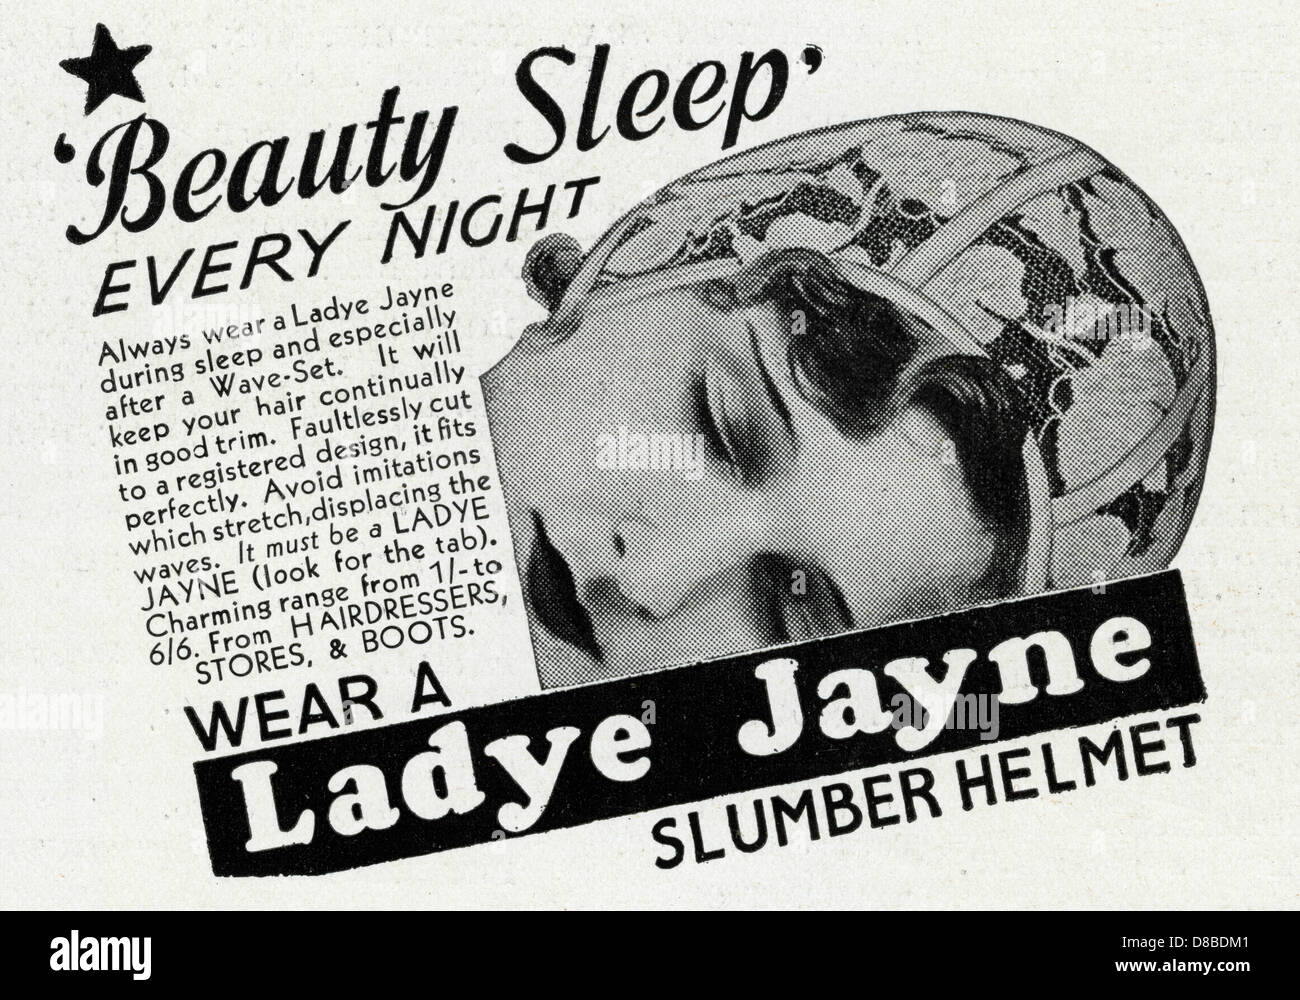 Advert For Ladye Jayne Slumber Helmet 1934 - Stock Image